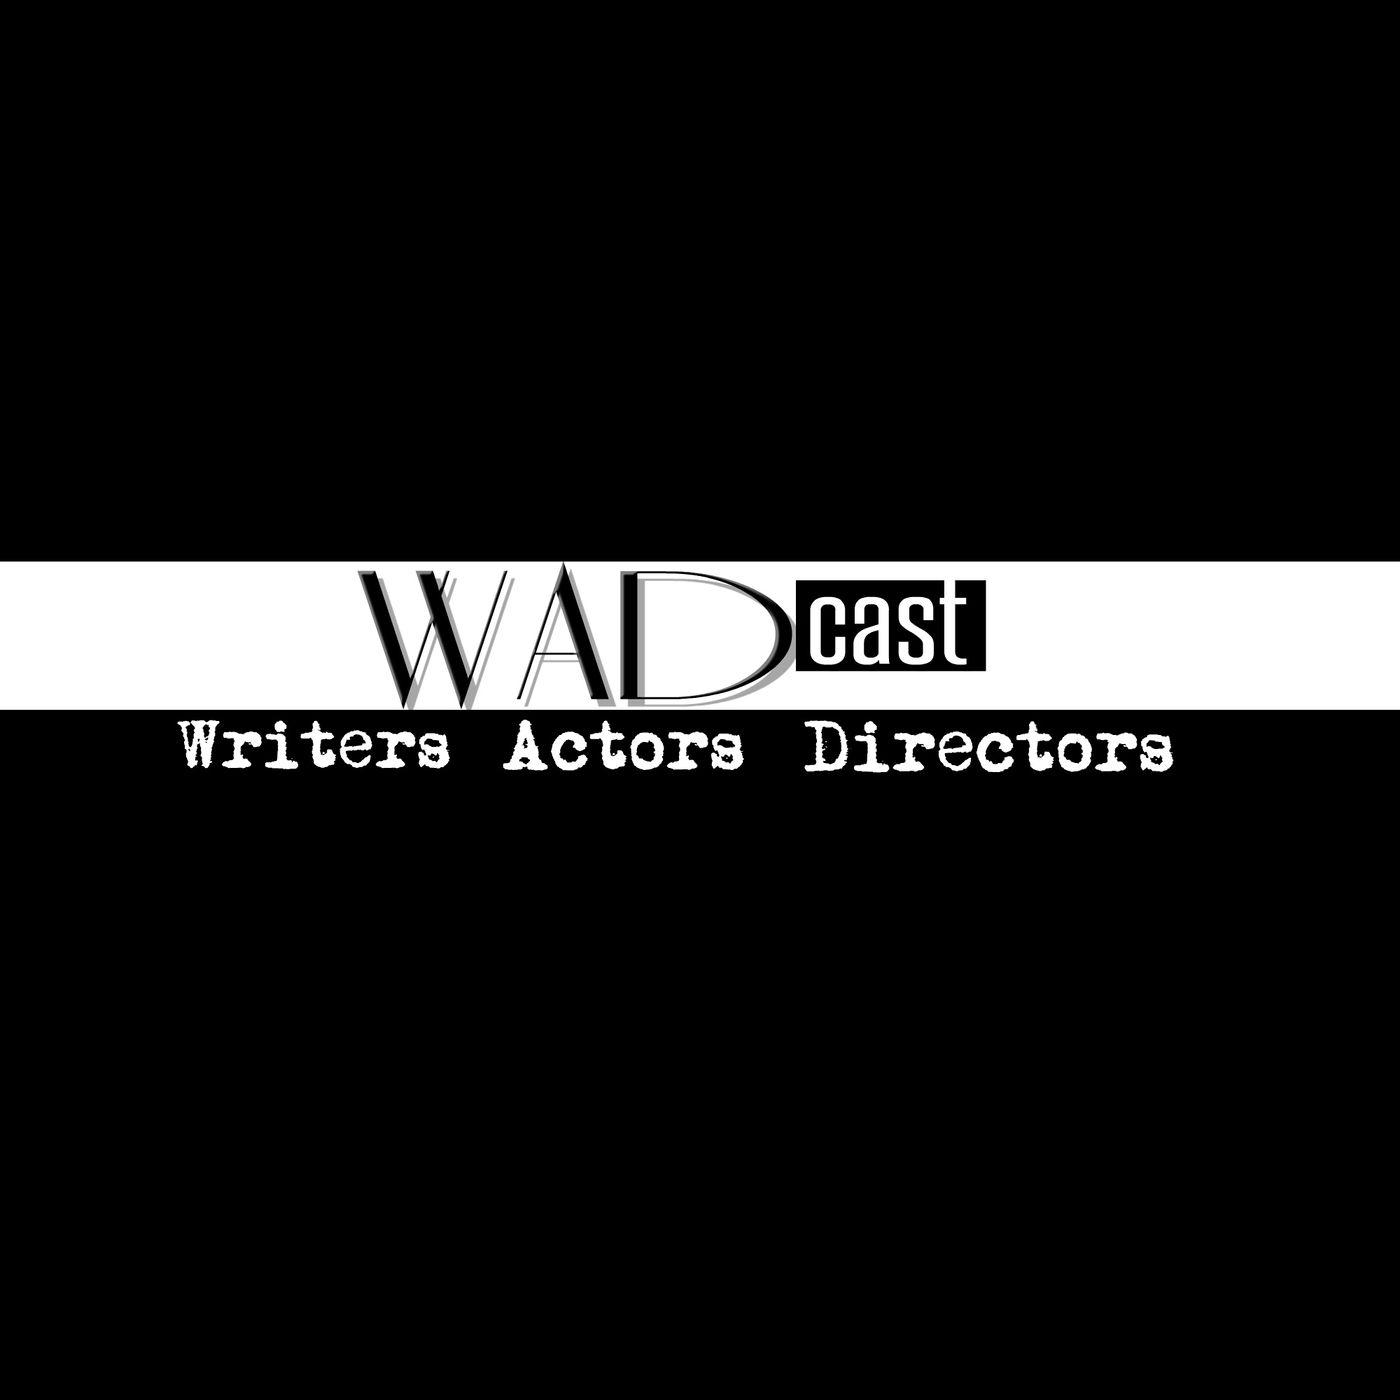 WADcast #53: Swip Swap Til You Drop